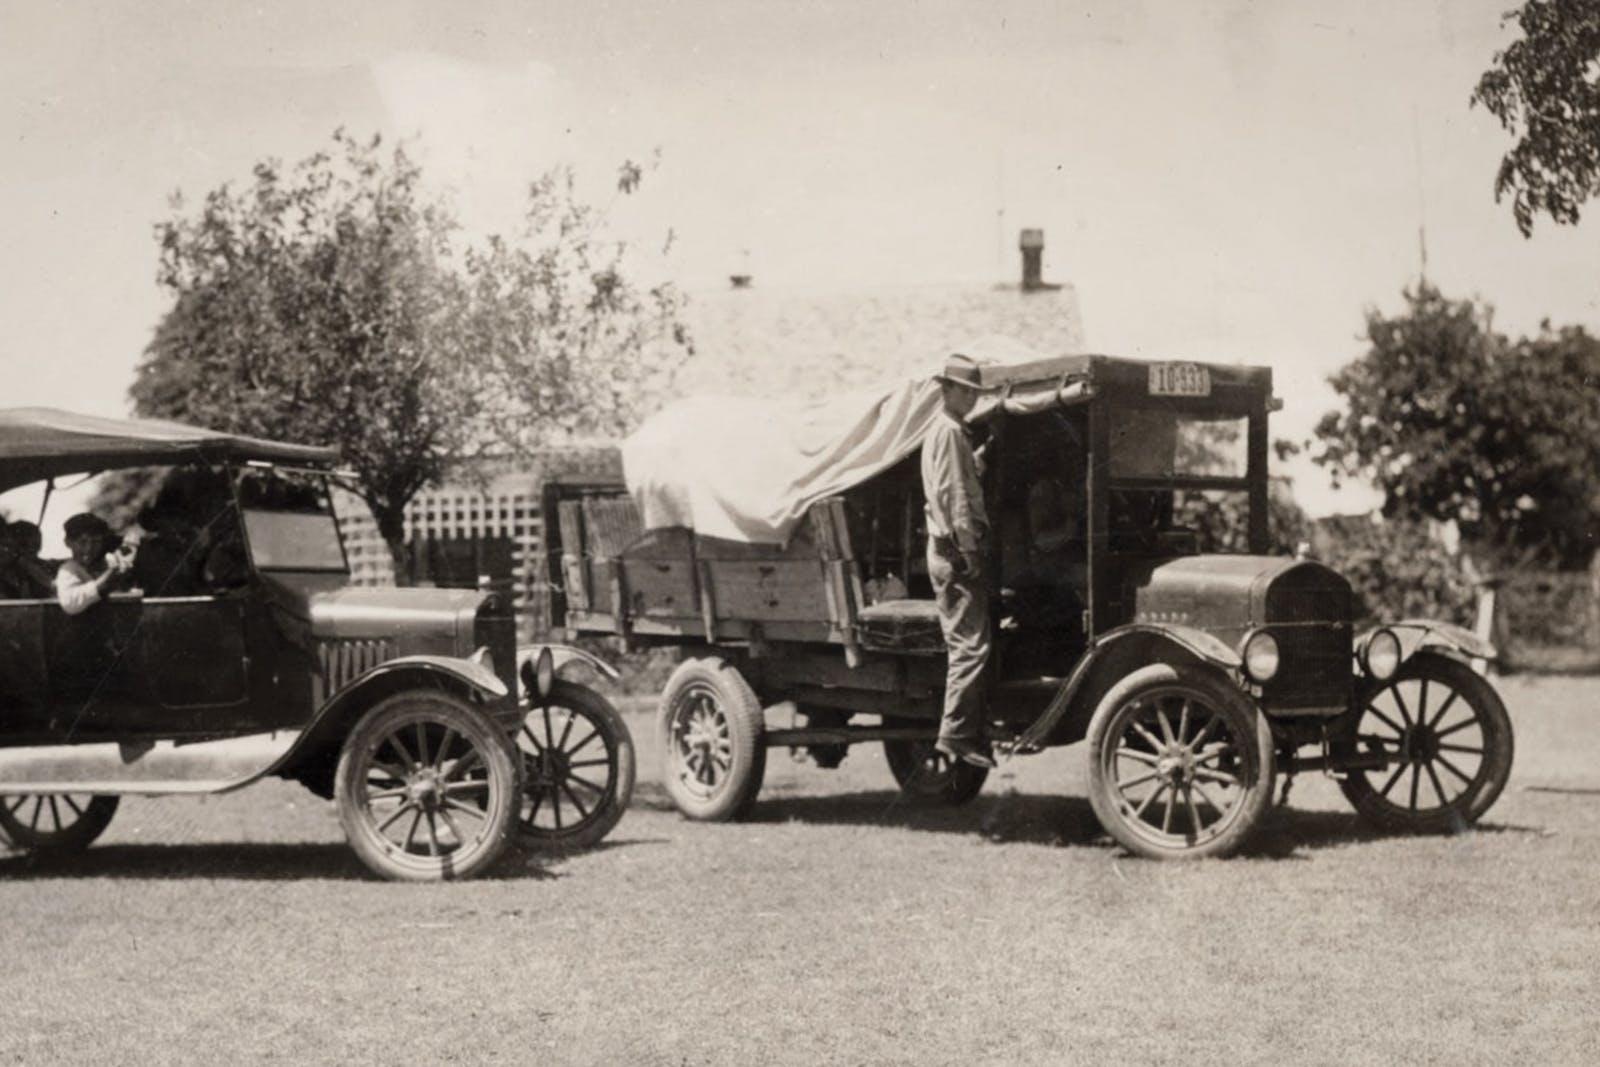 Cedar choppers in Austin in the early twentieth century.